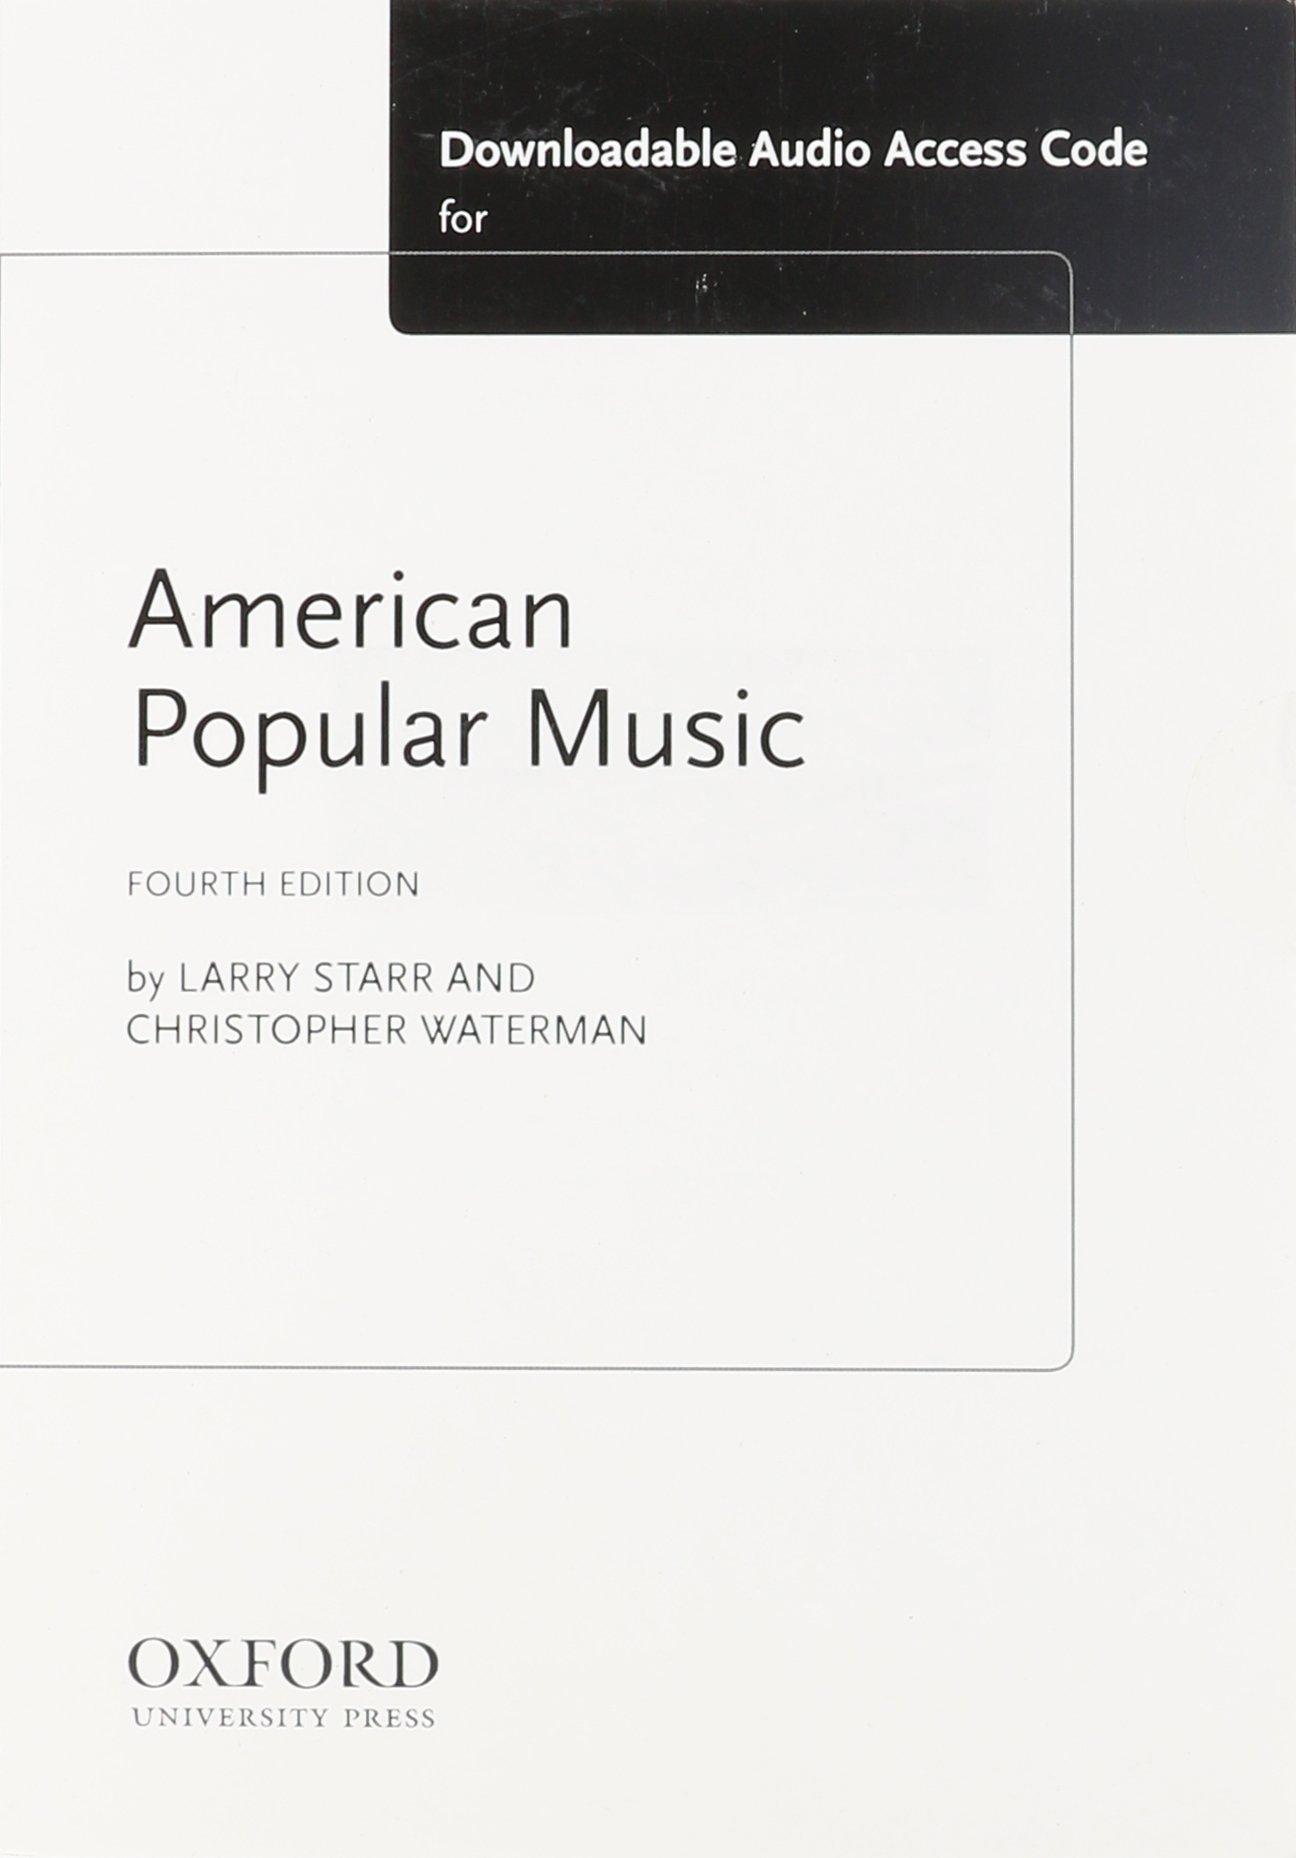 Download American Popular Music MP3 Download Access Card ebook